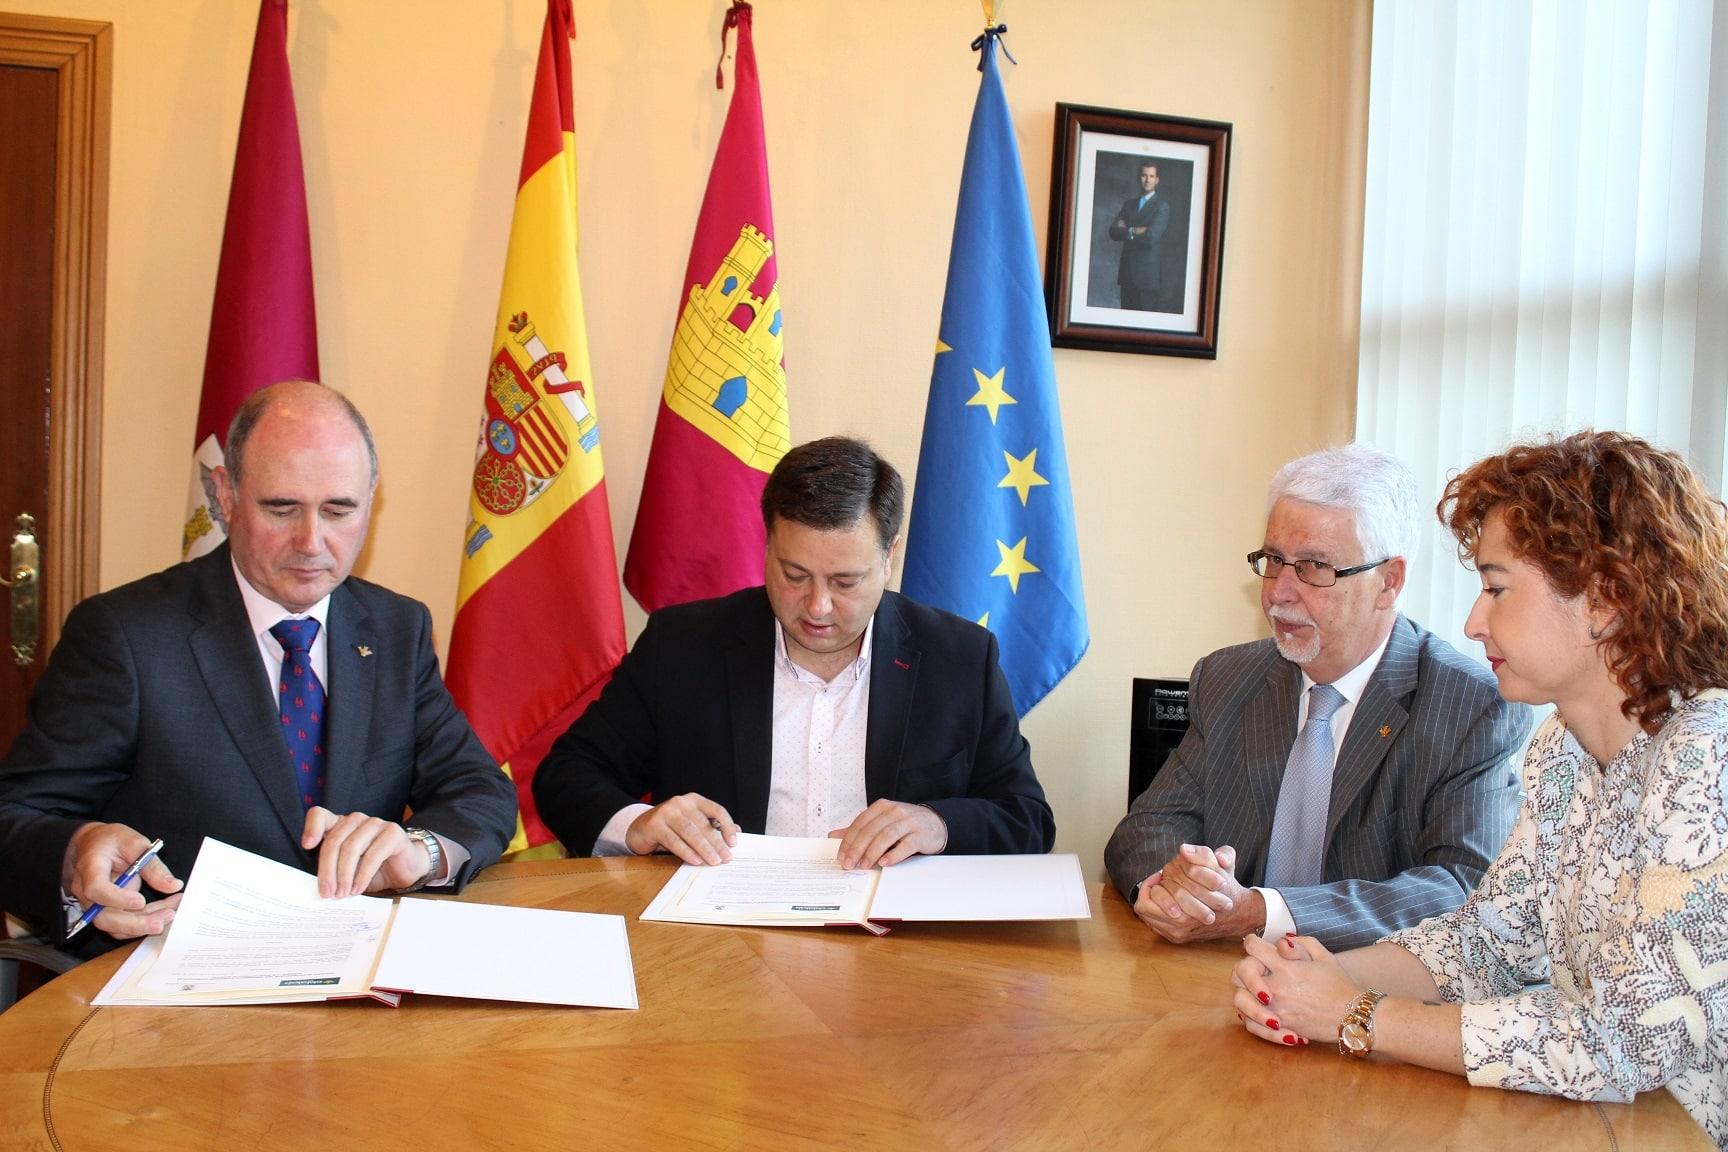 https://blog.globalcaja.es/wp-content/uploads/2018/06/Foto.Firma-convenio-Globalcaja.11-6-18.jpg